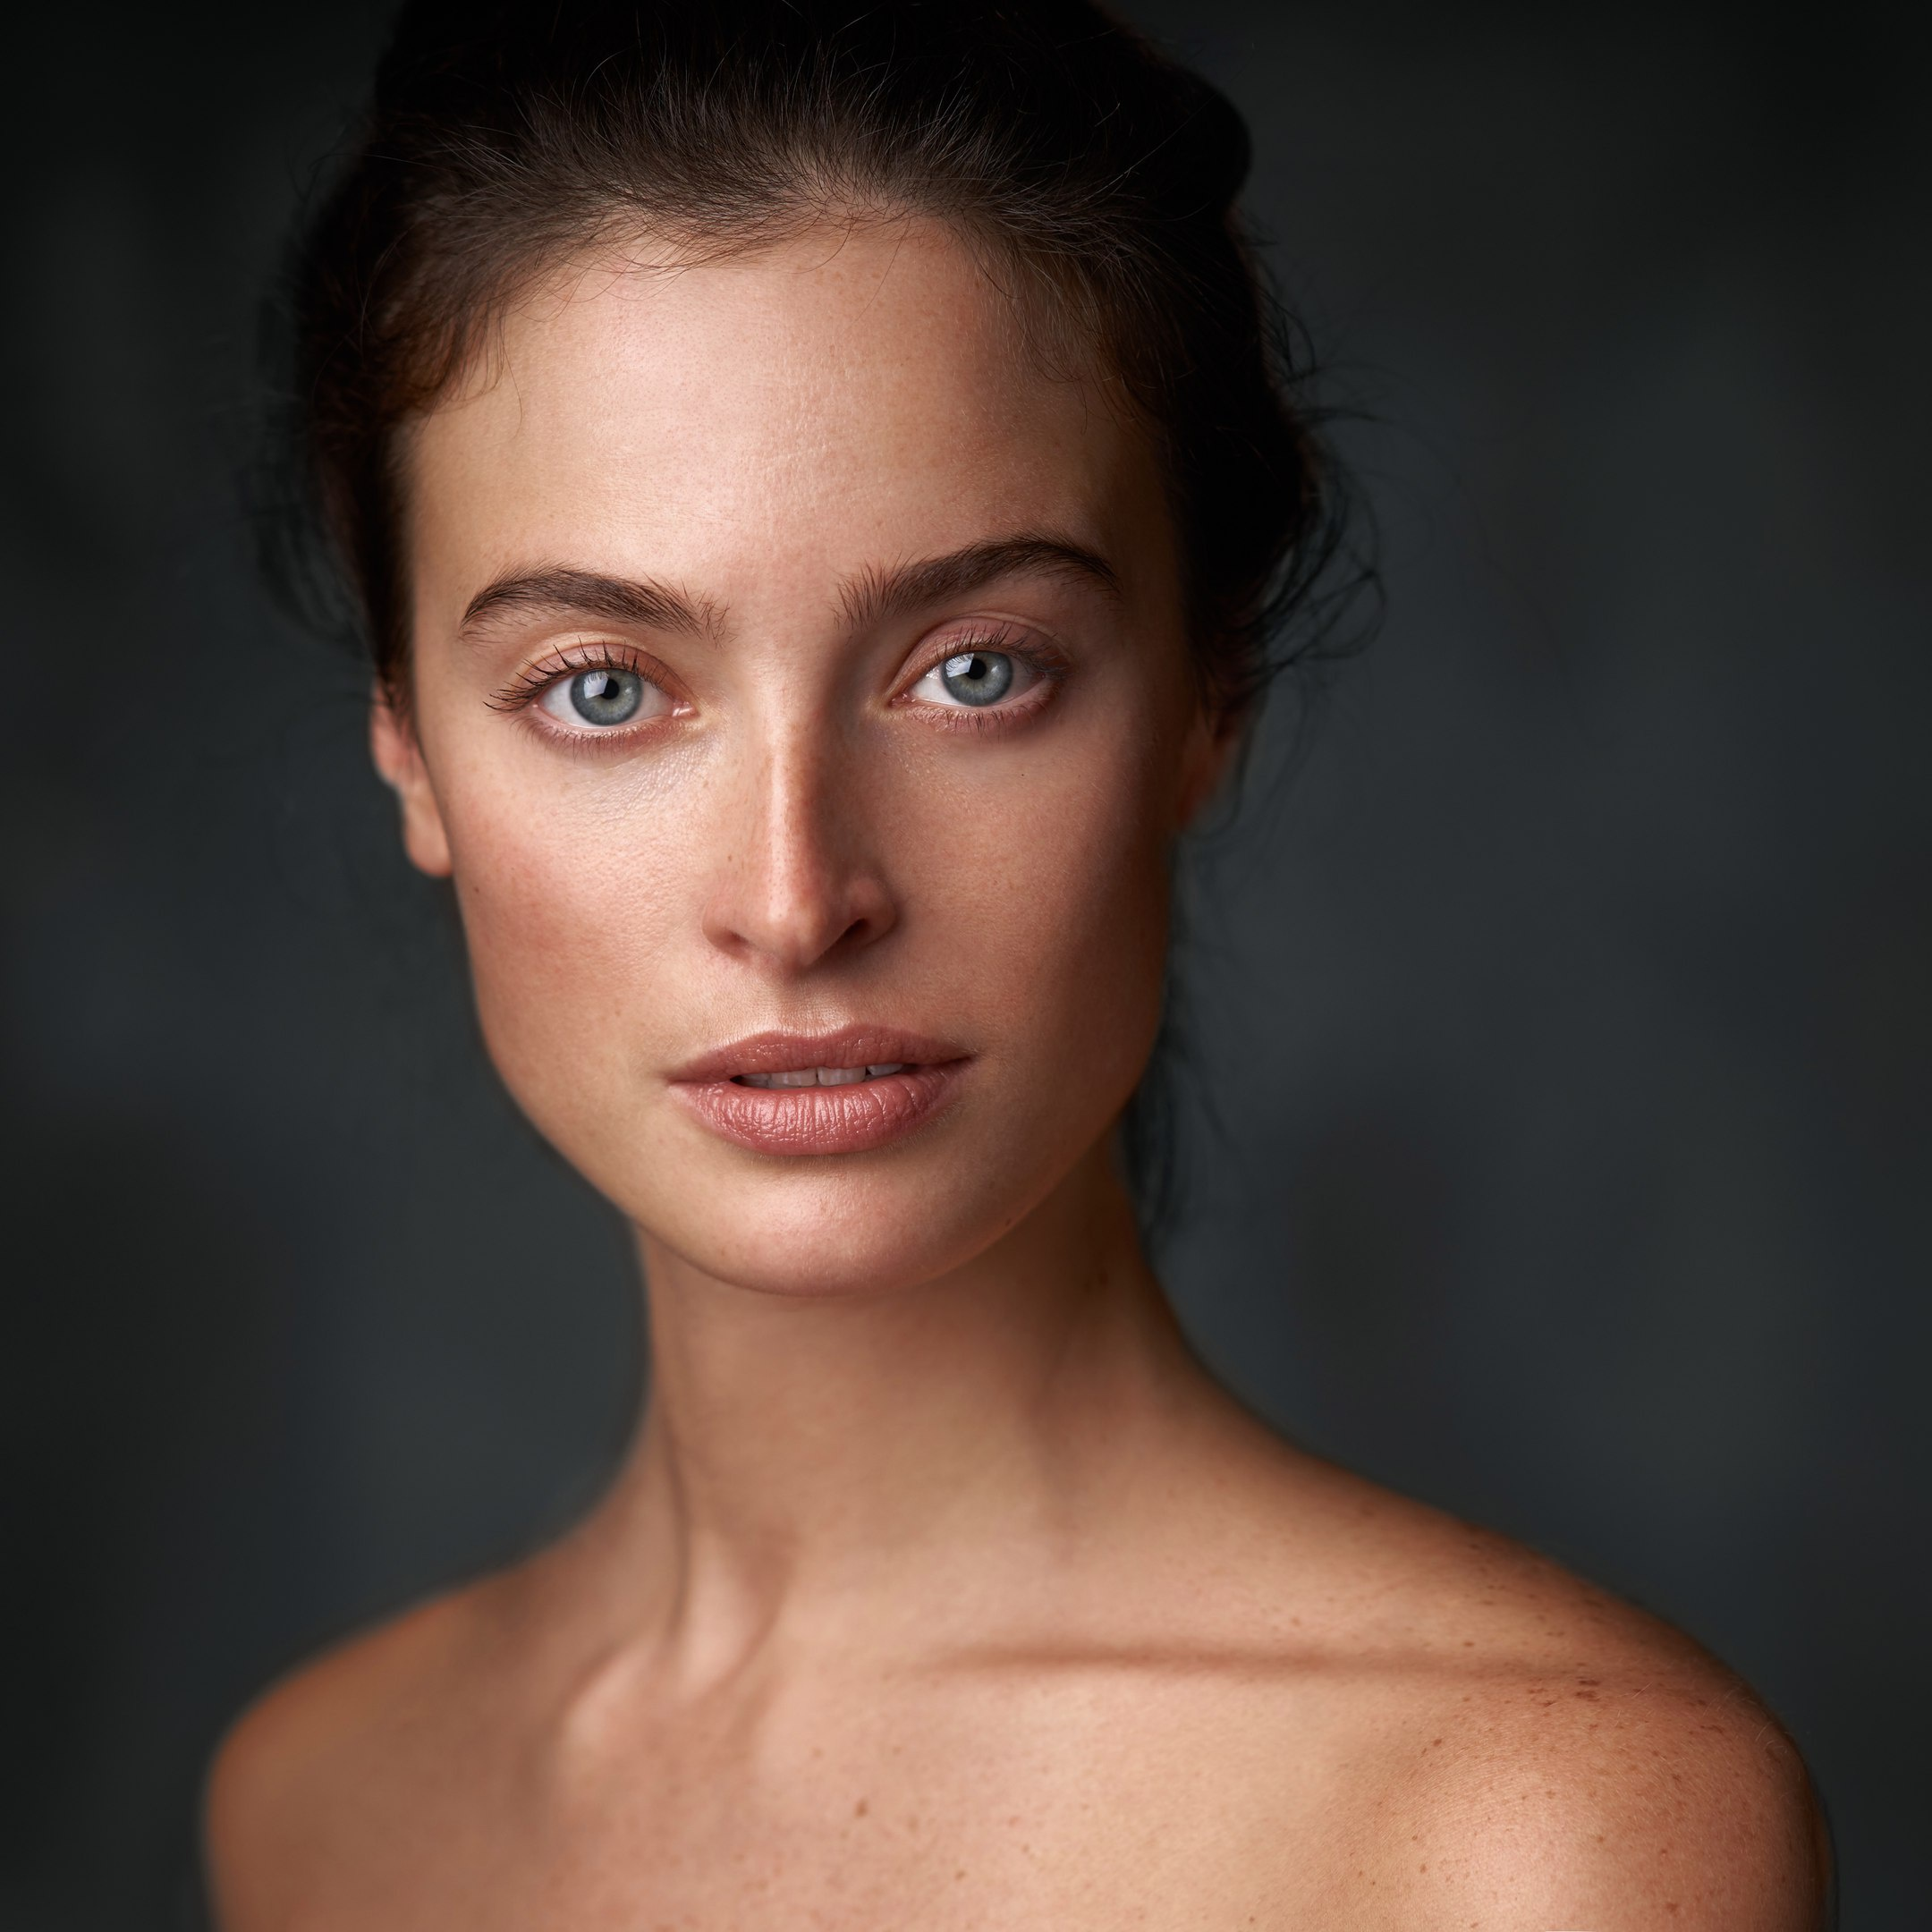 Картинки лиц девушек без макияжа